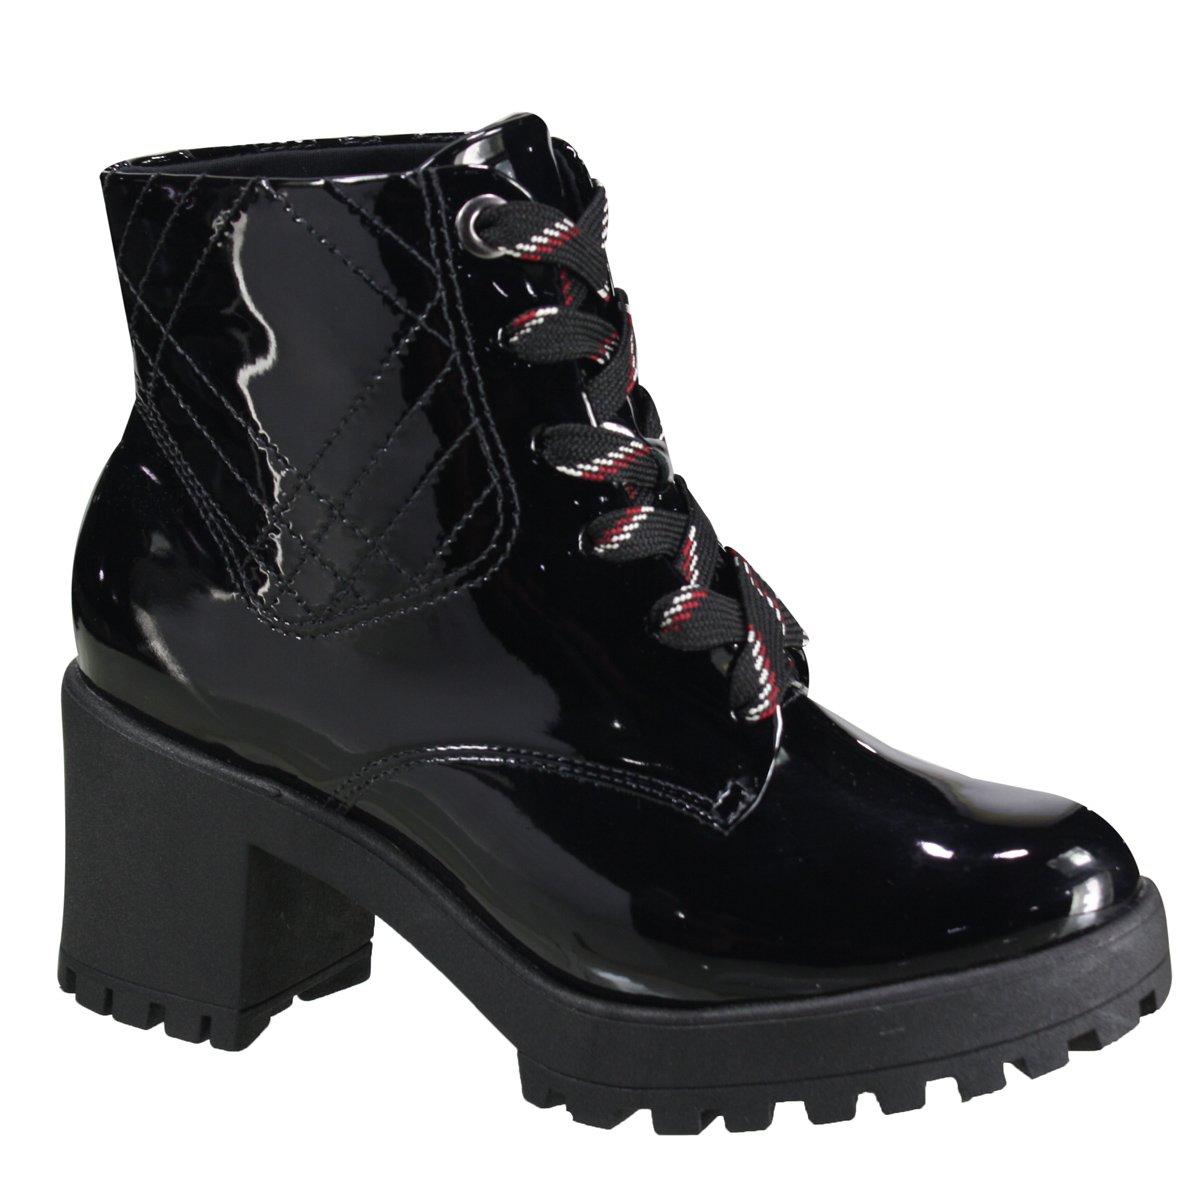 9f9c261c86 Bota Ramarim Ankle Boot Feminina 19-56102 000001 - Preto (Verniz ...